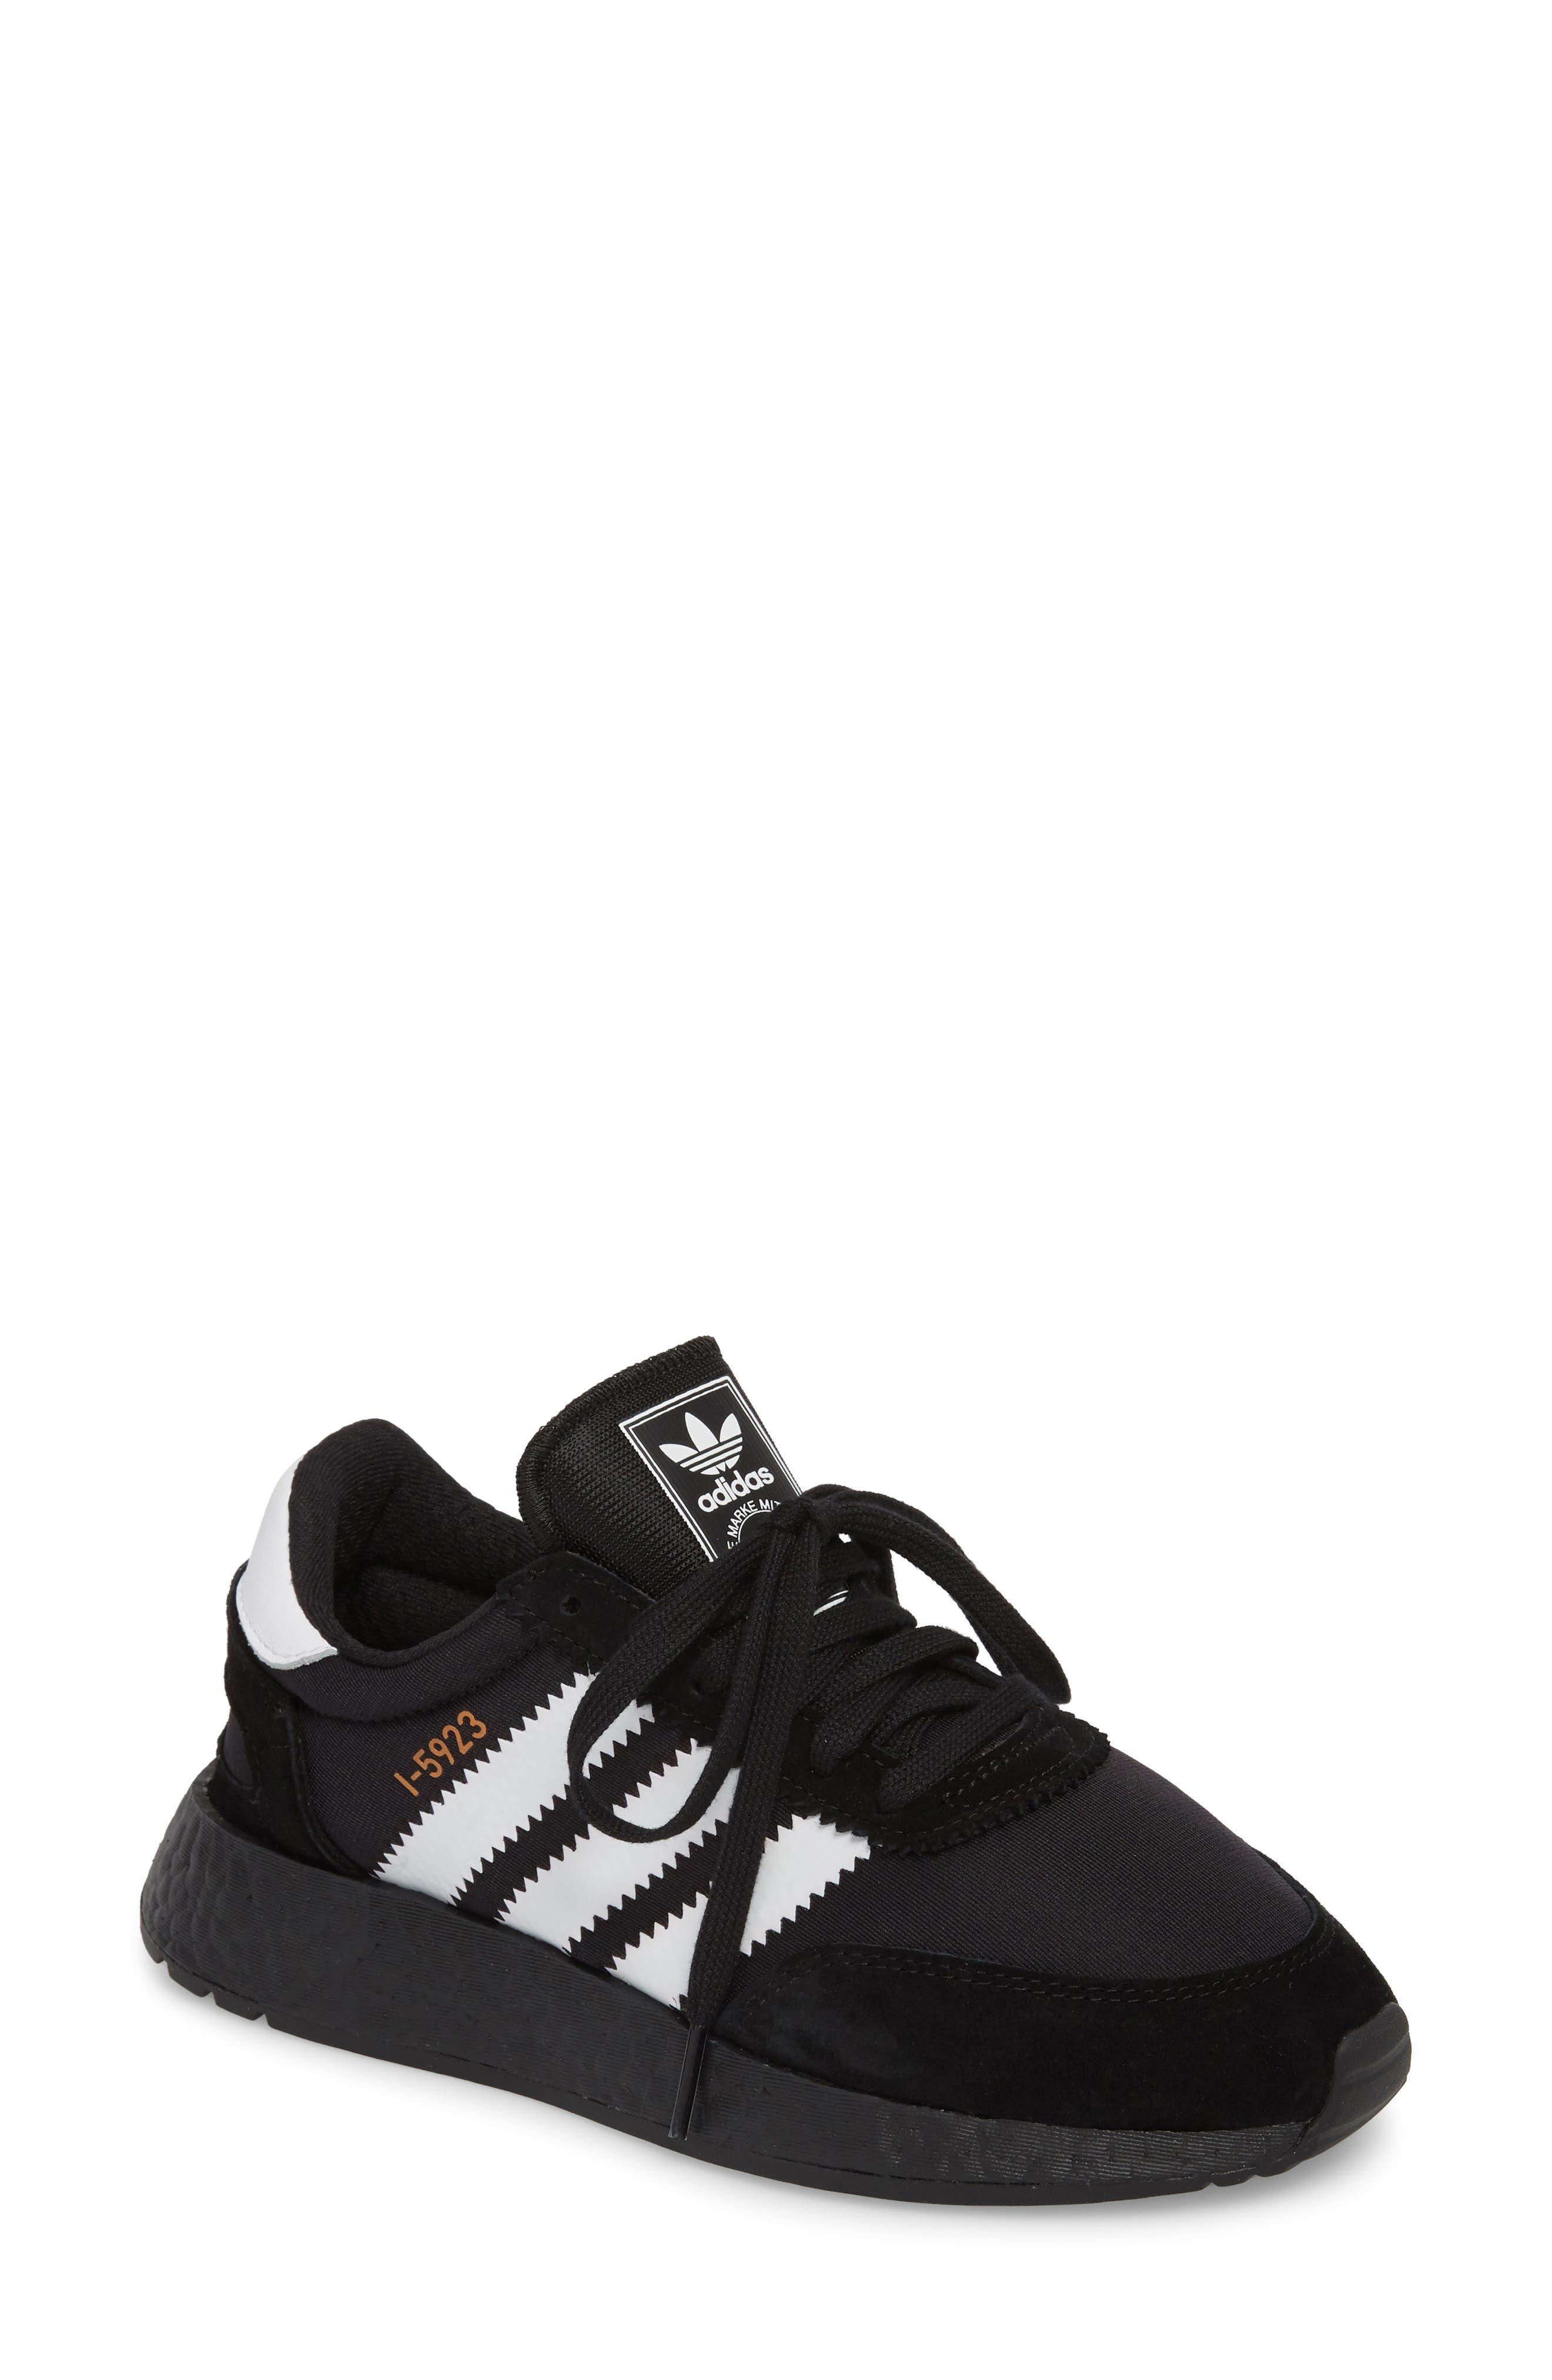 adidas - sneaker (frauen) 5923 nordstrom